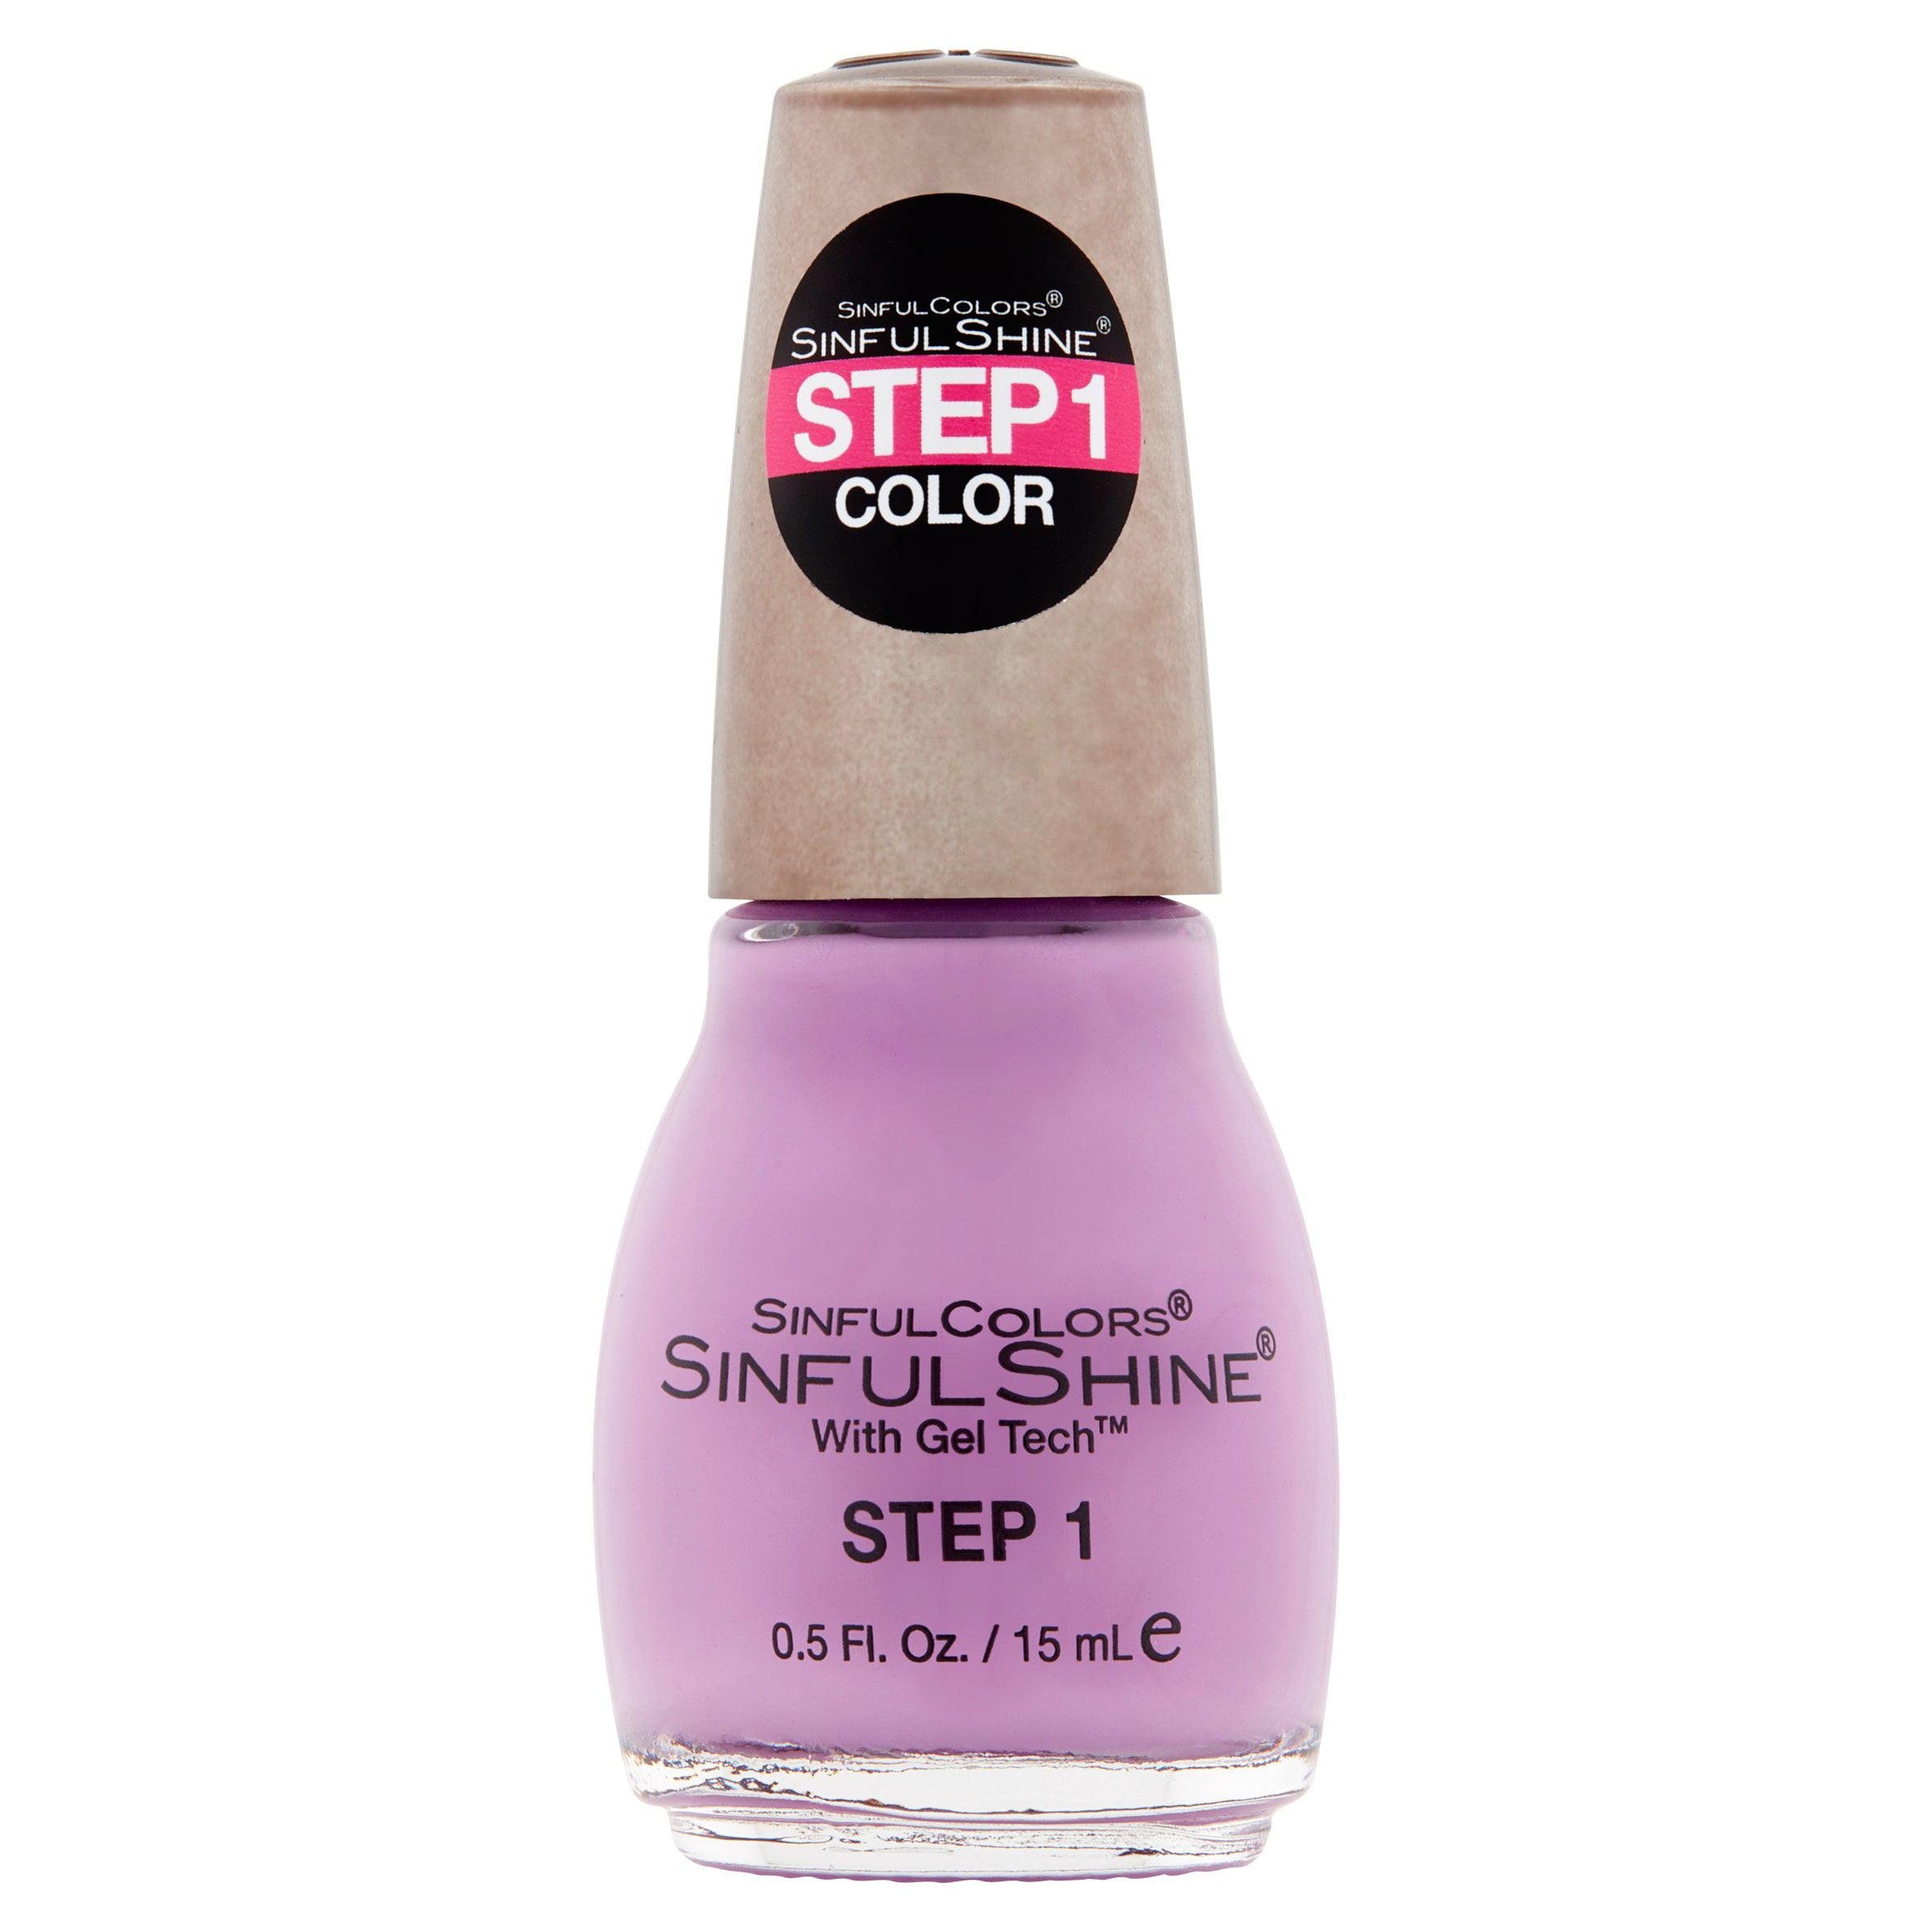 SinfulColors SinfulShine Step 1 Color Nail Color, Pragmatic, 0.5 fl oz